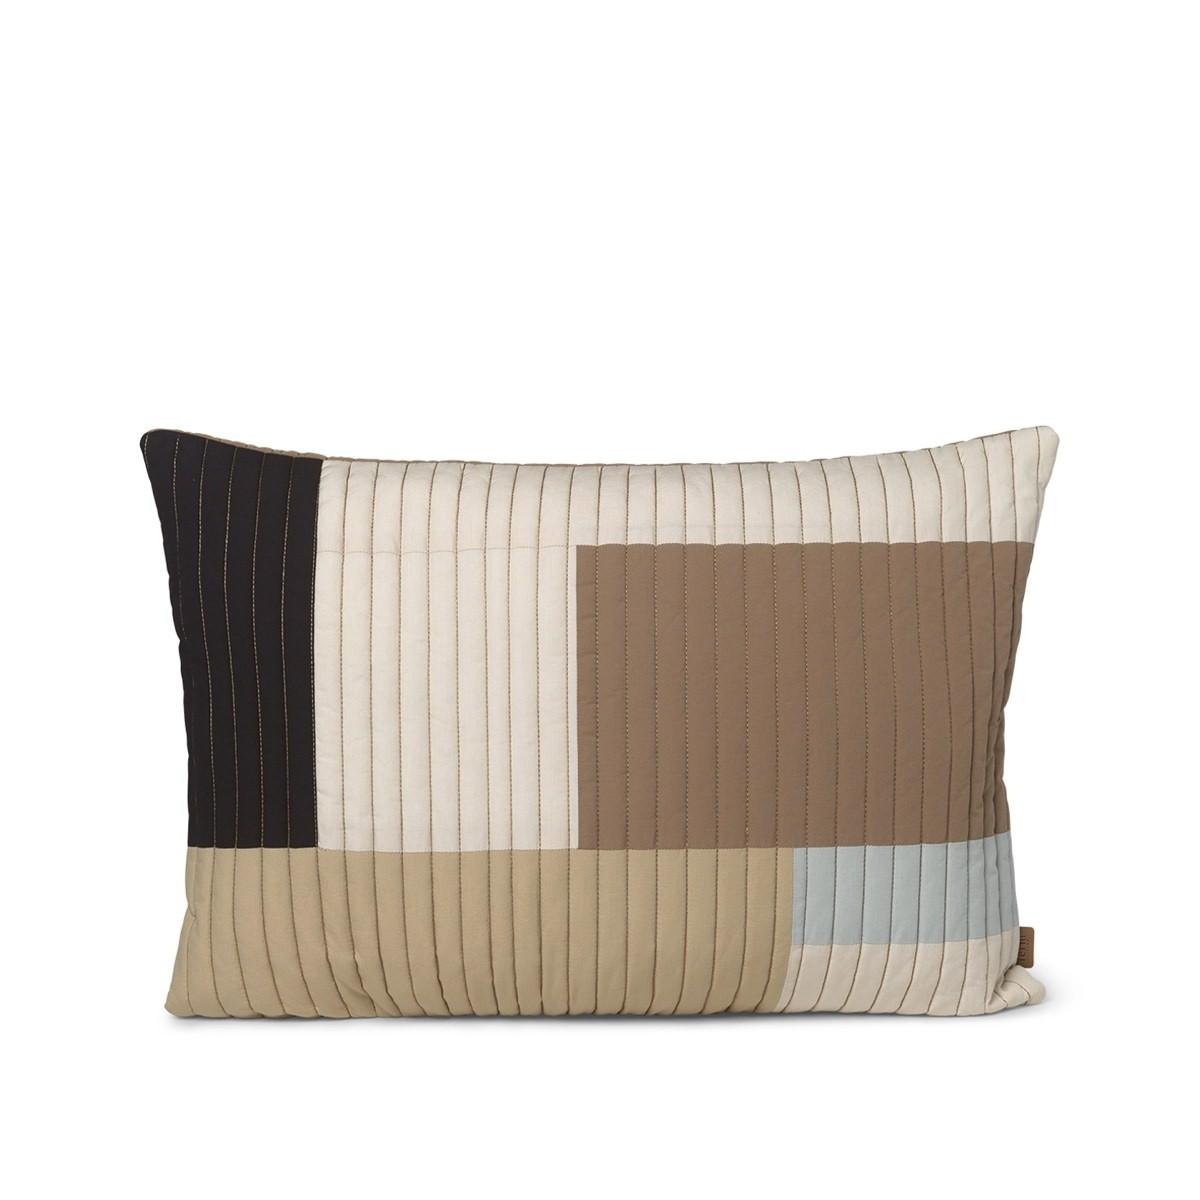 Ferm Living Shay Cushion